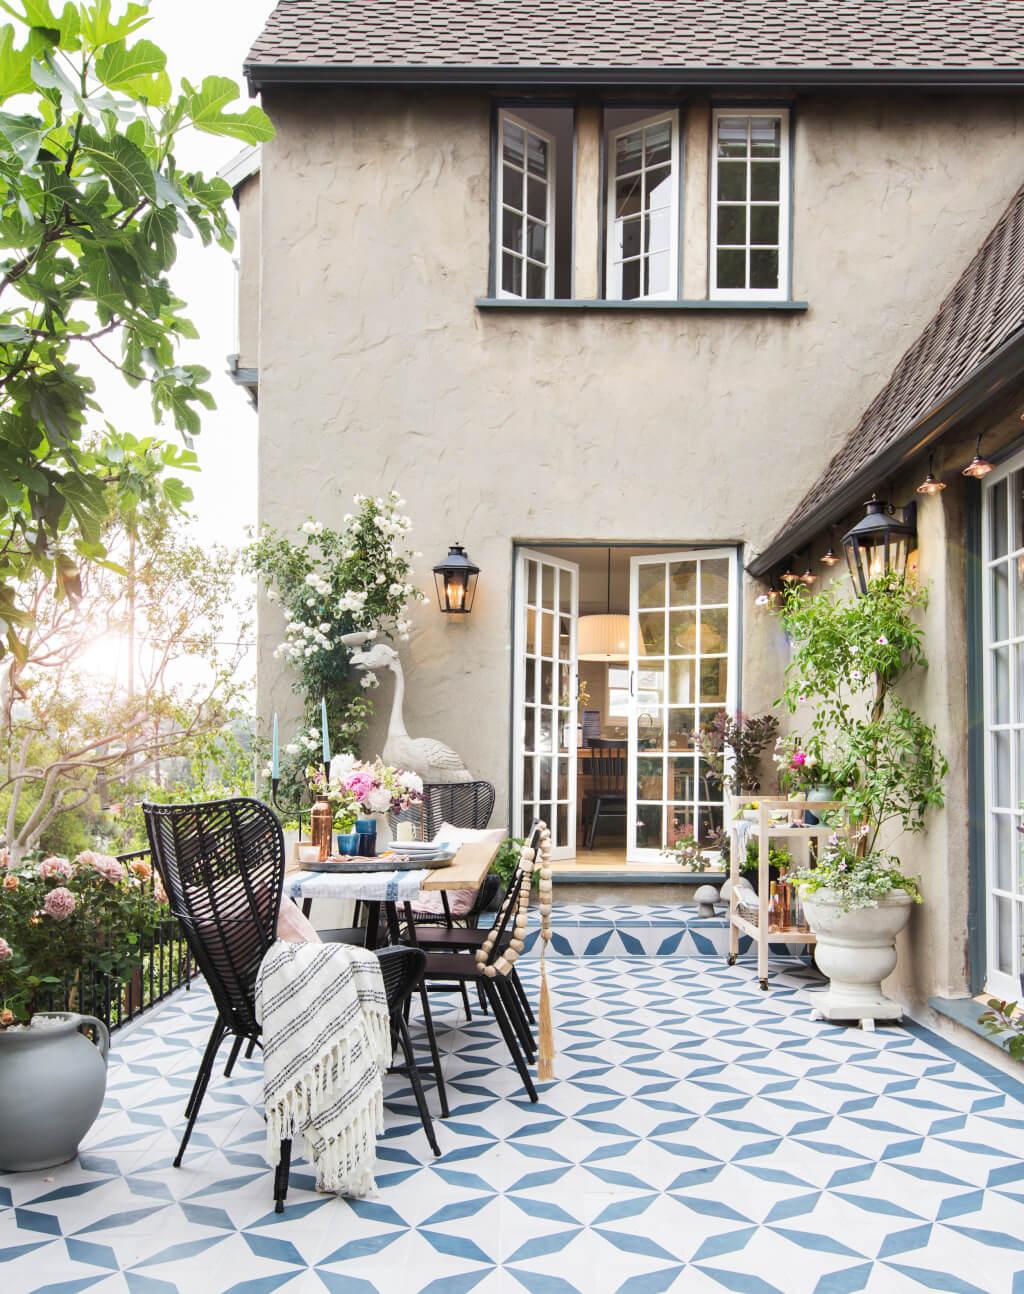 Emily-Henderson_House-Beautiful_Courtyard_Tile_Modern_English_Country_9-1024x1294.jpg